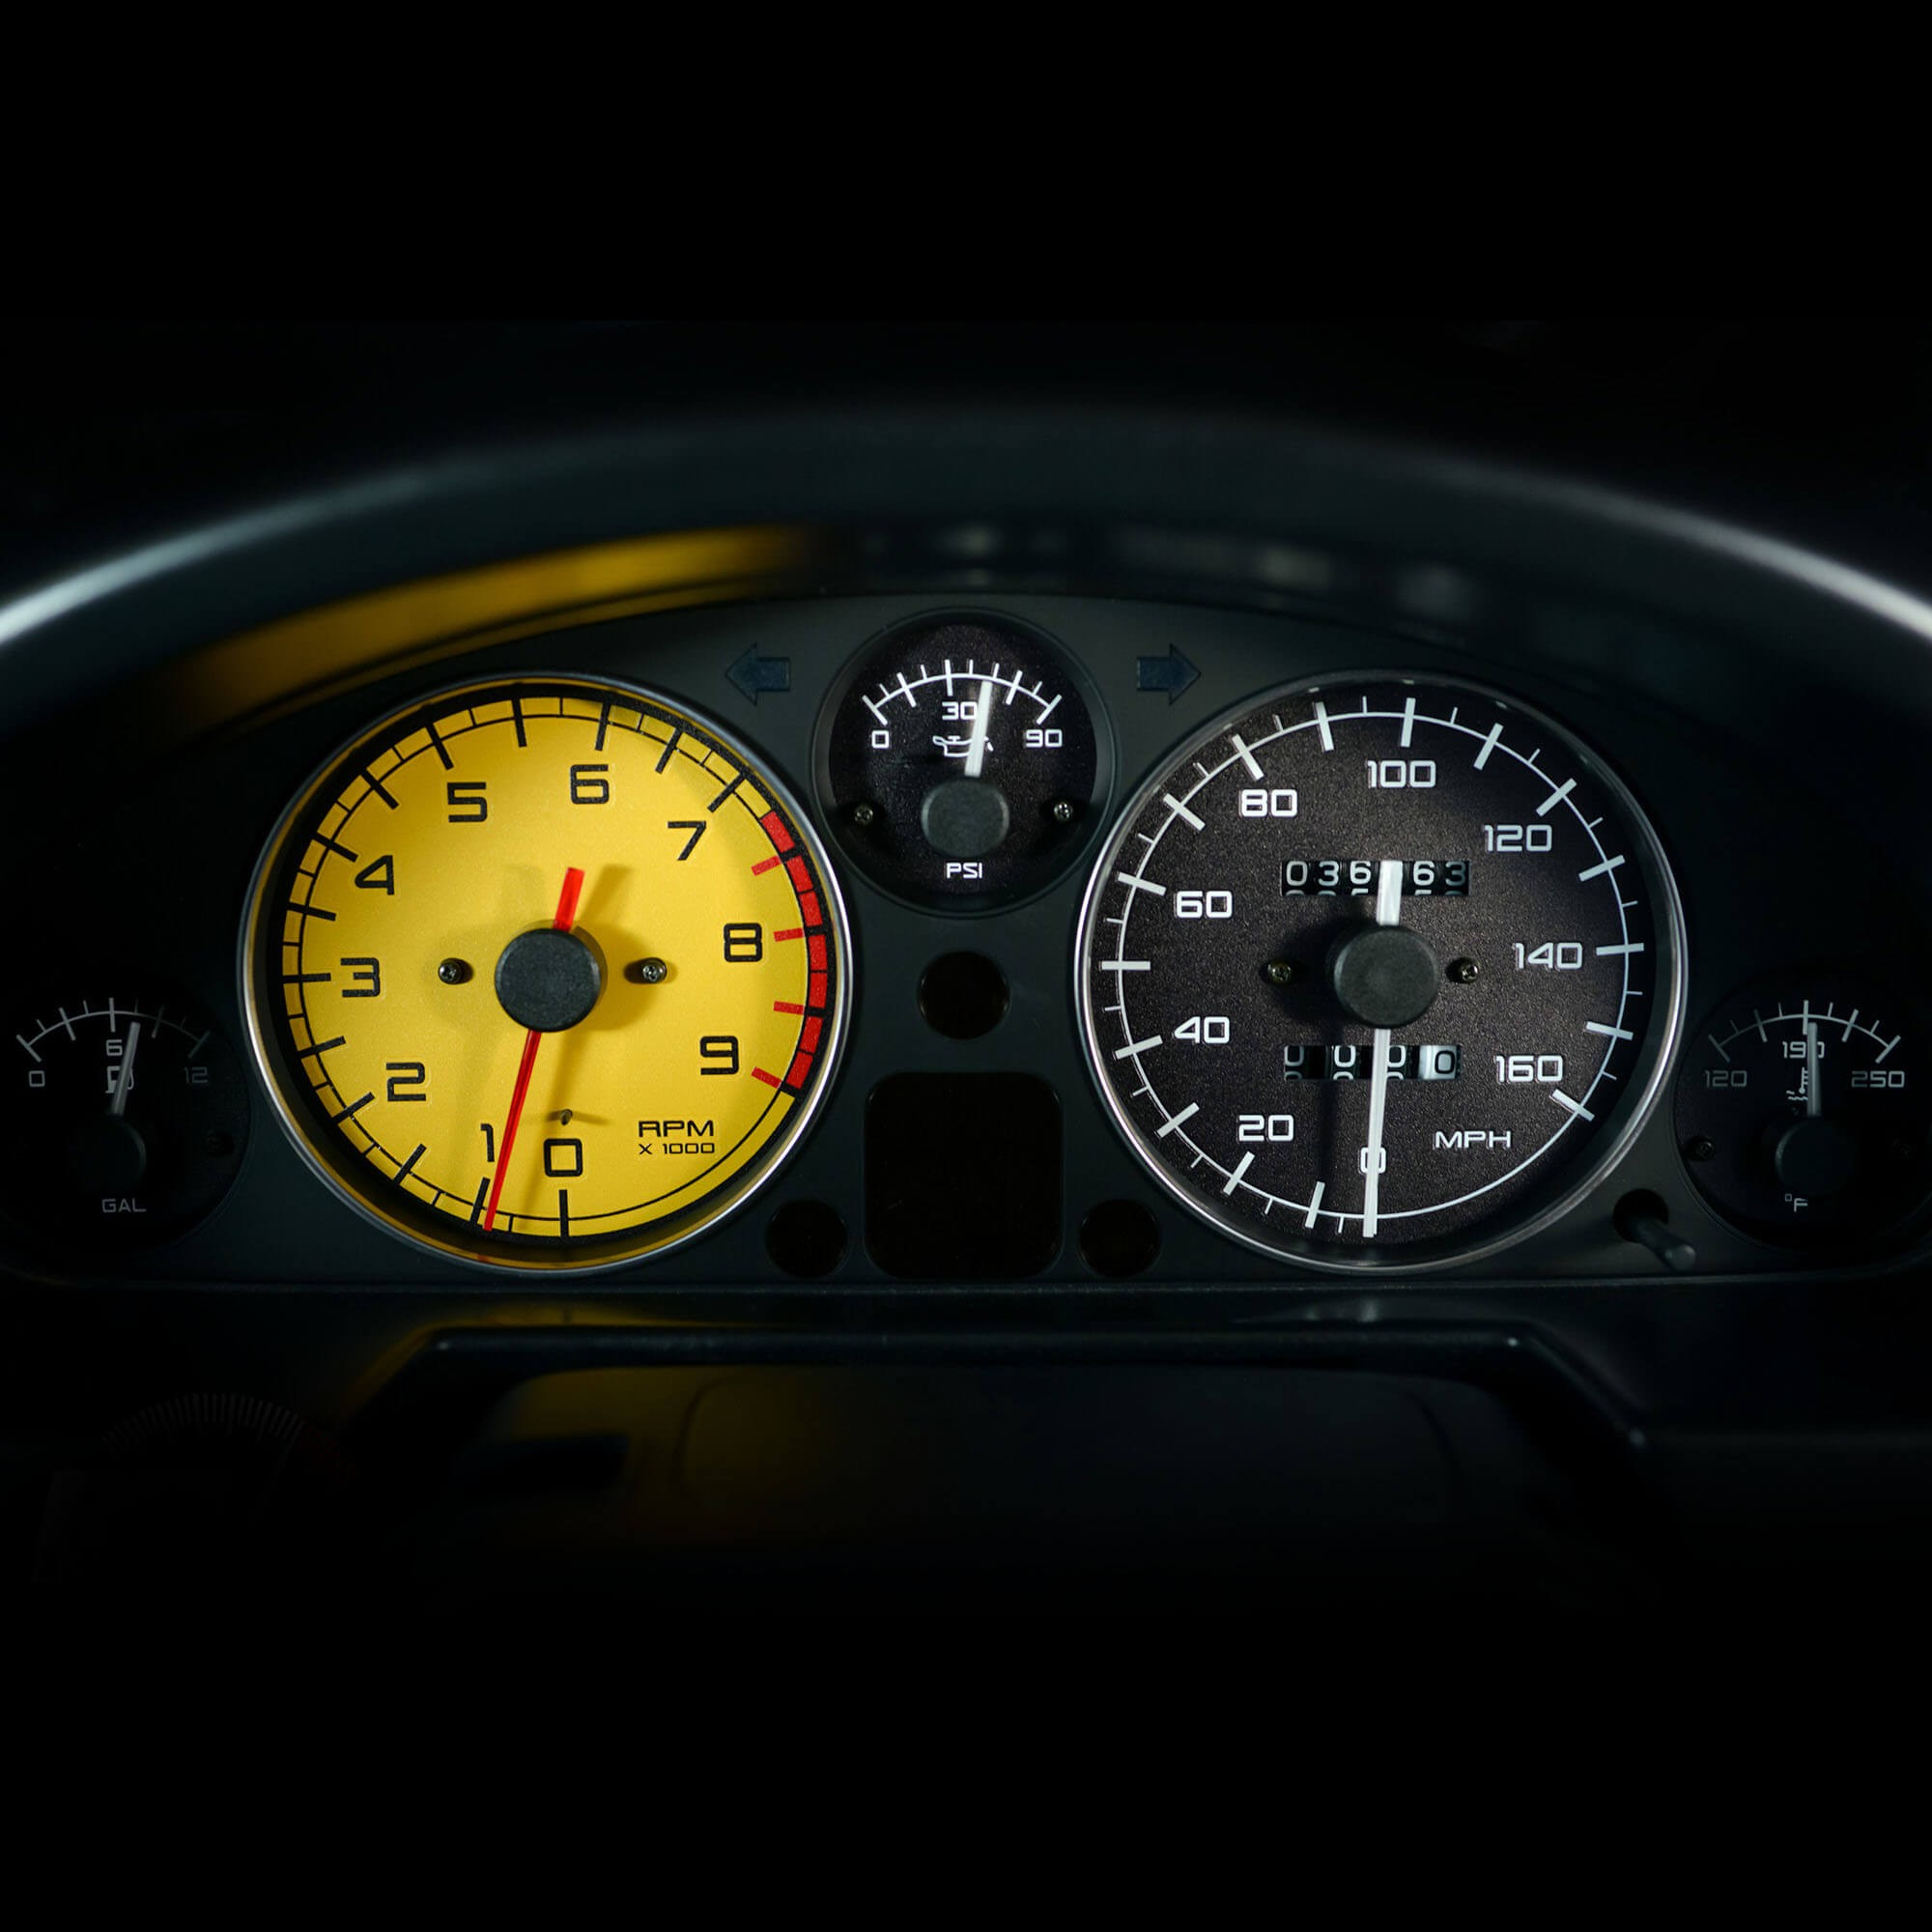 Mazda Miata For Sale >> Sunstorm Gauge Face by Revlimiter - Interior - 1999-2005 MX-5 Miata   MossMiata